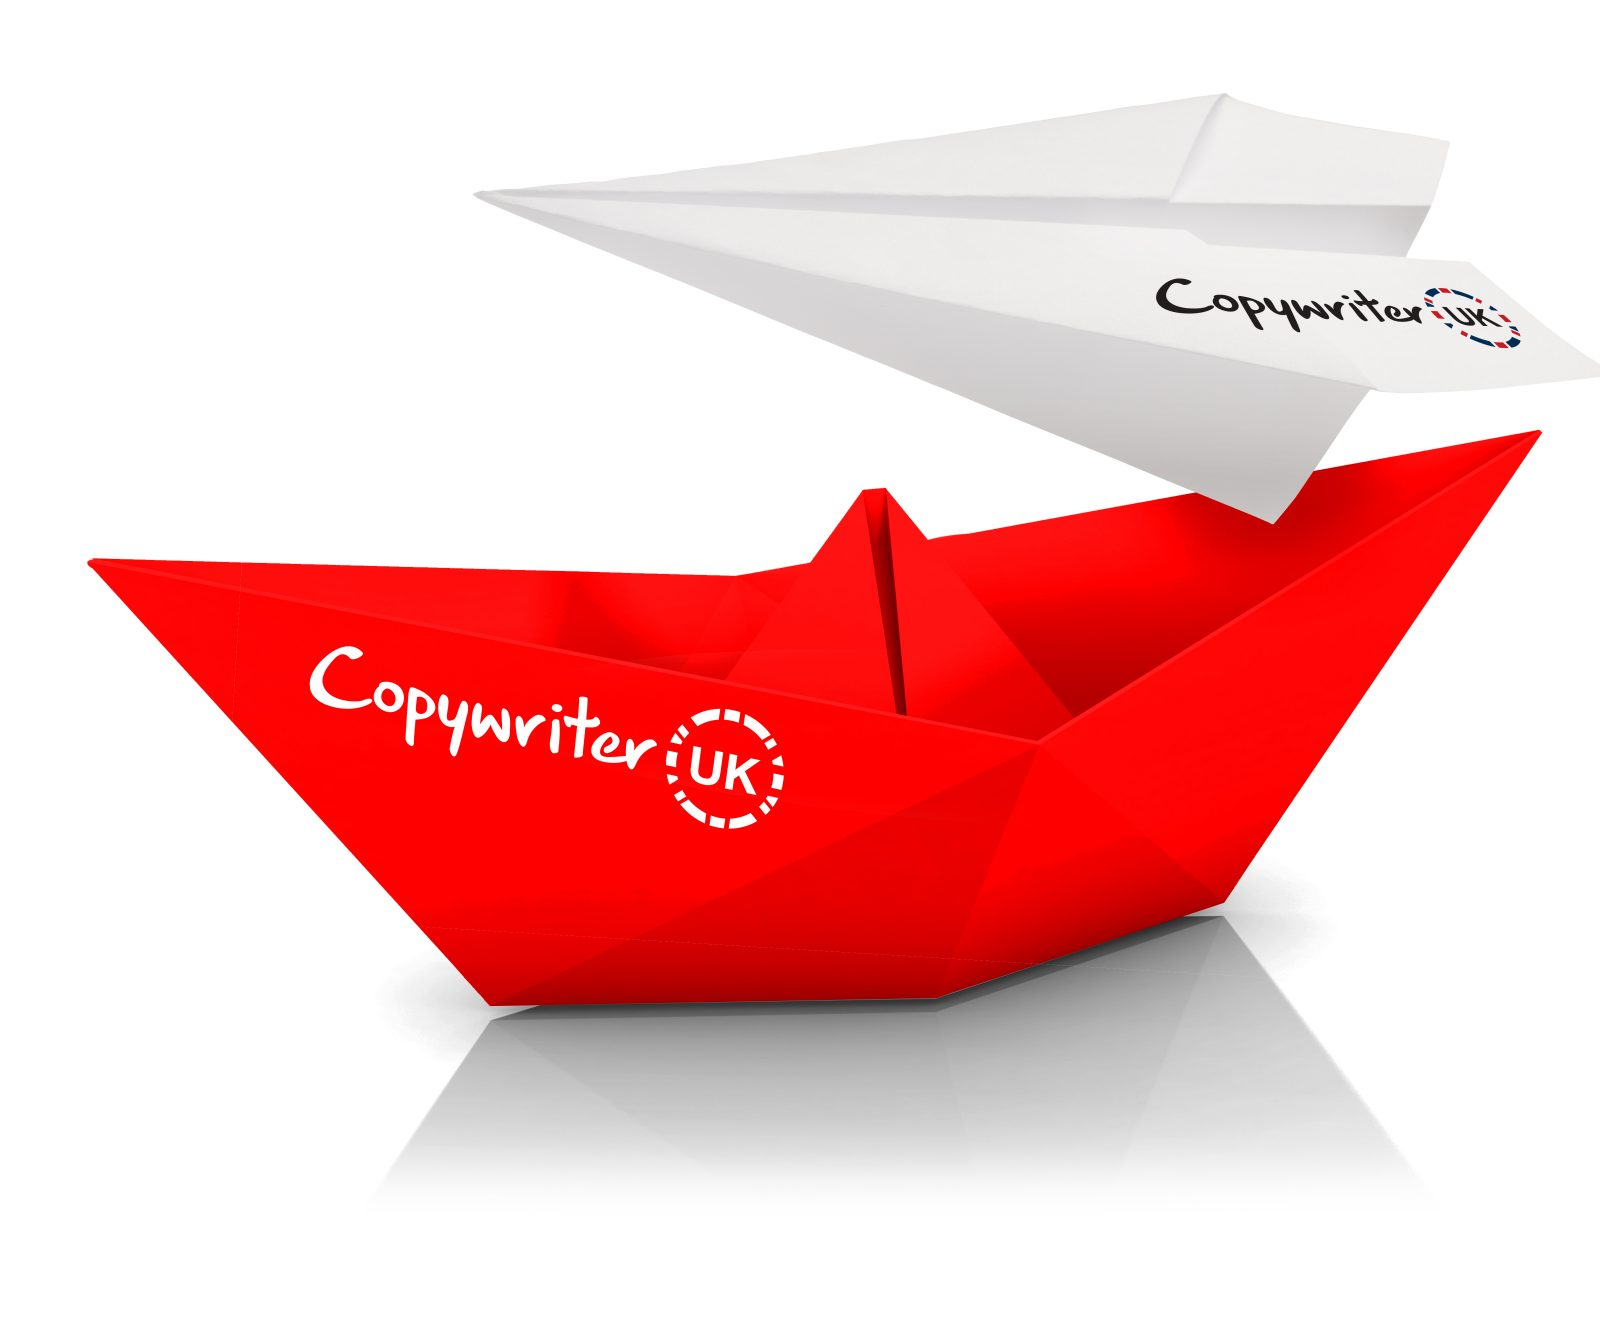 UK Copywriting for Overseas Businesses